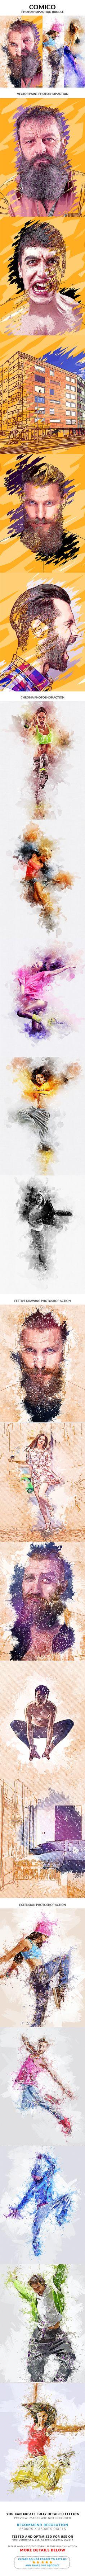 Comico Photoshop Action Bundle - Photo Effects Actions